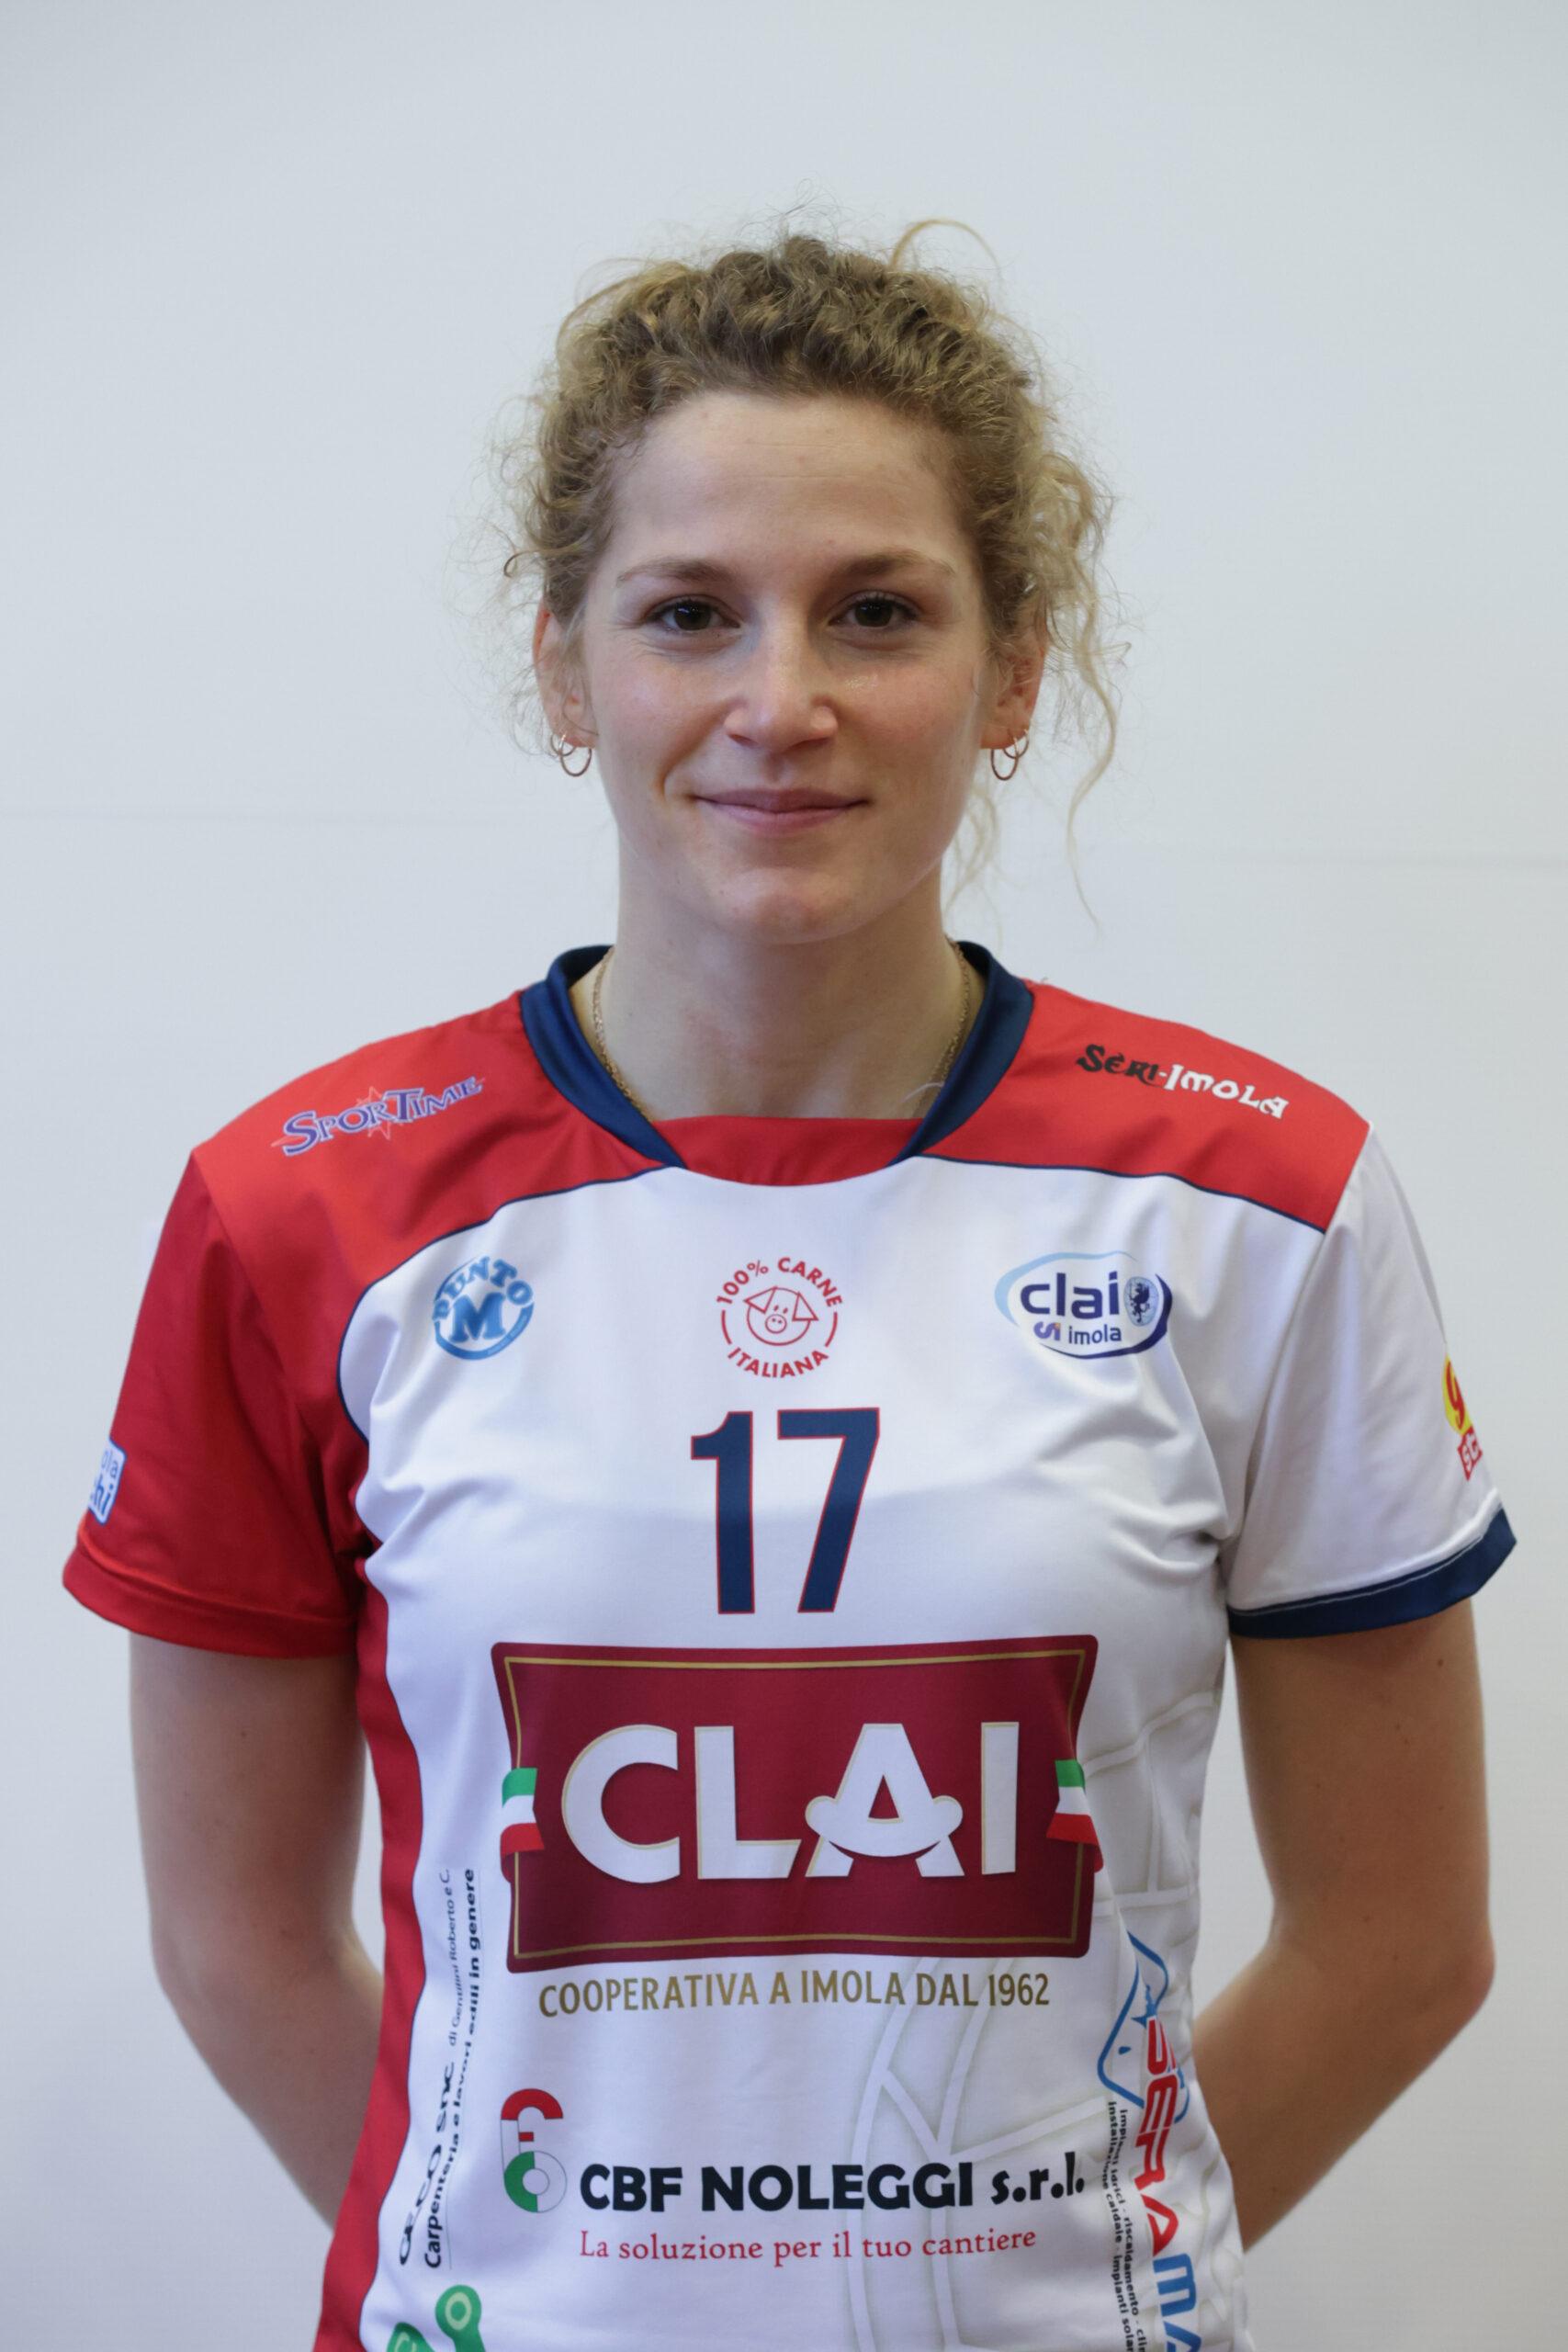 Valentina Balzani